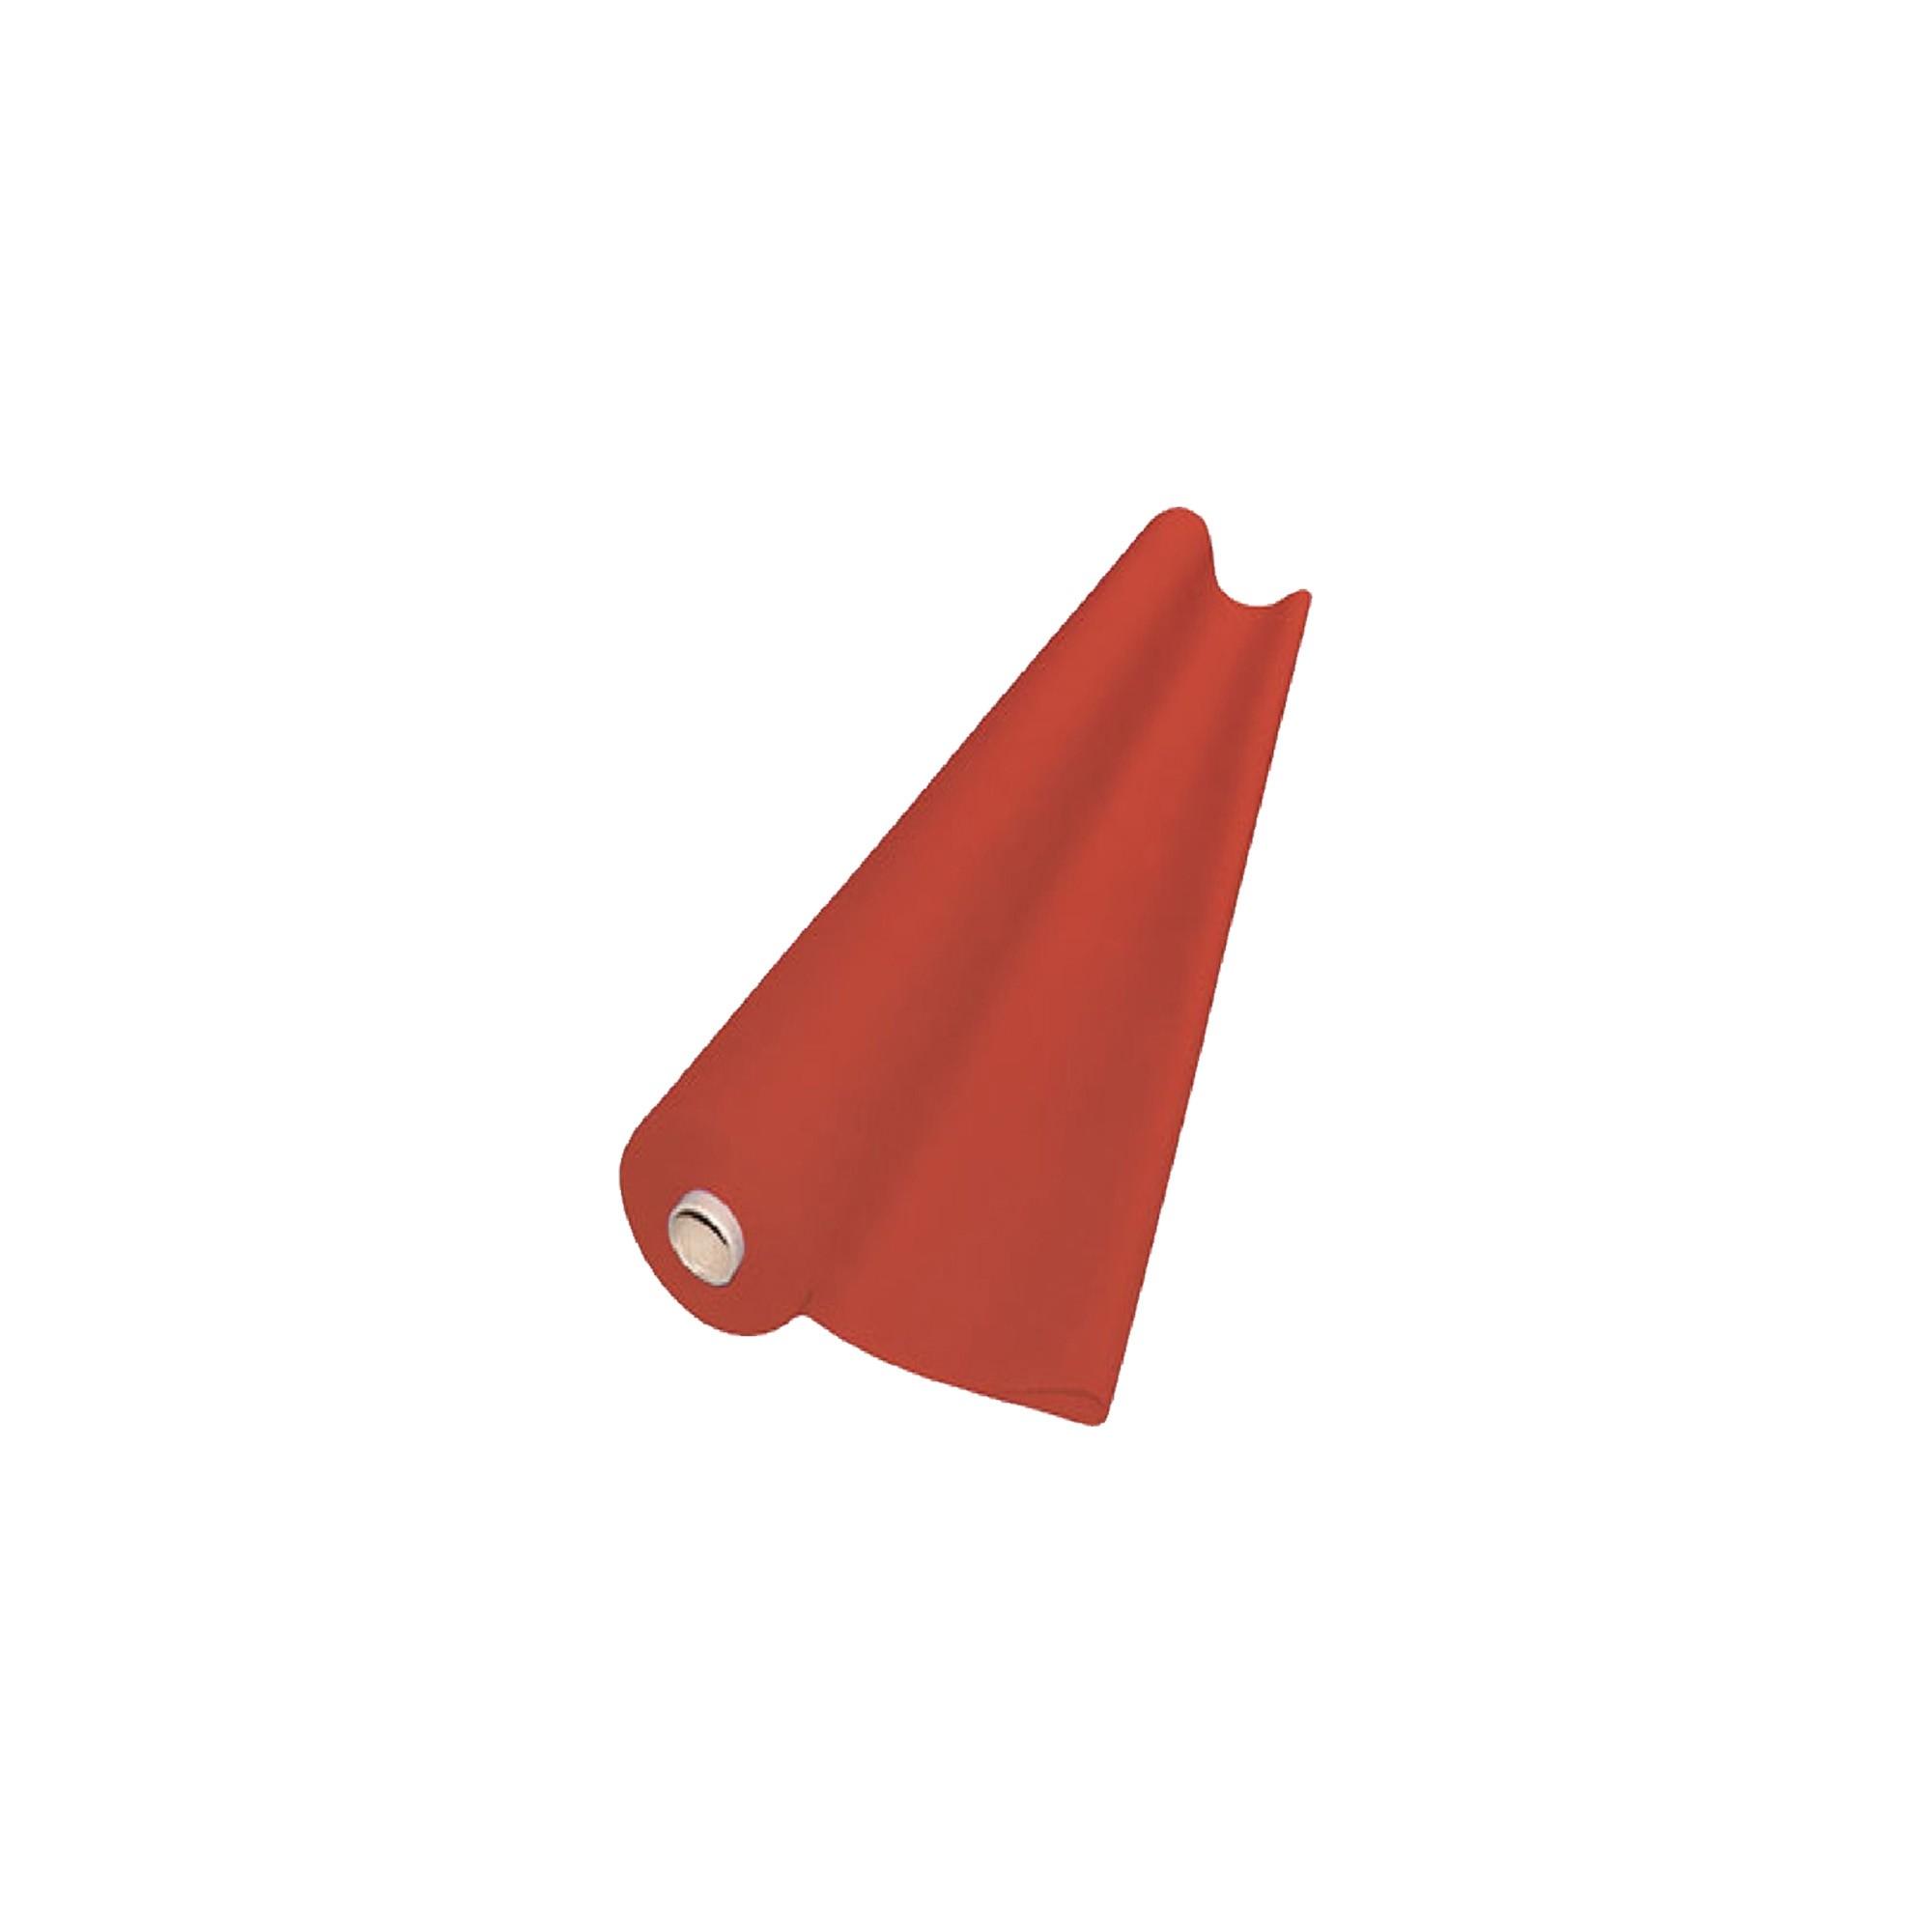 TNT LISO 10M - Vermelho